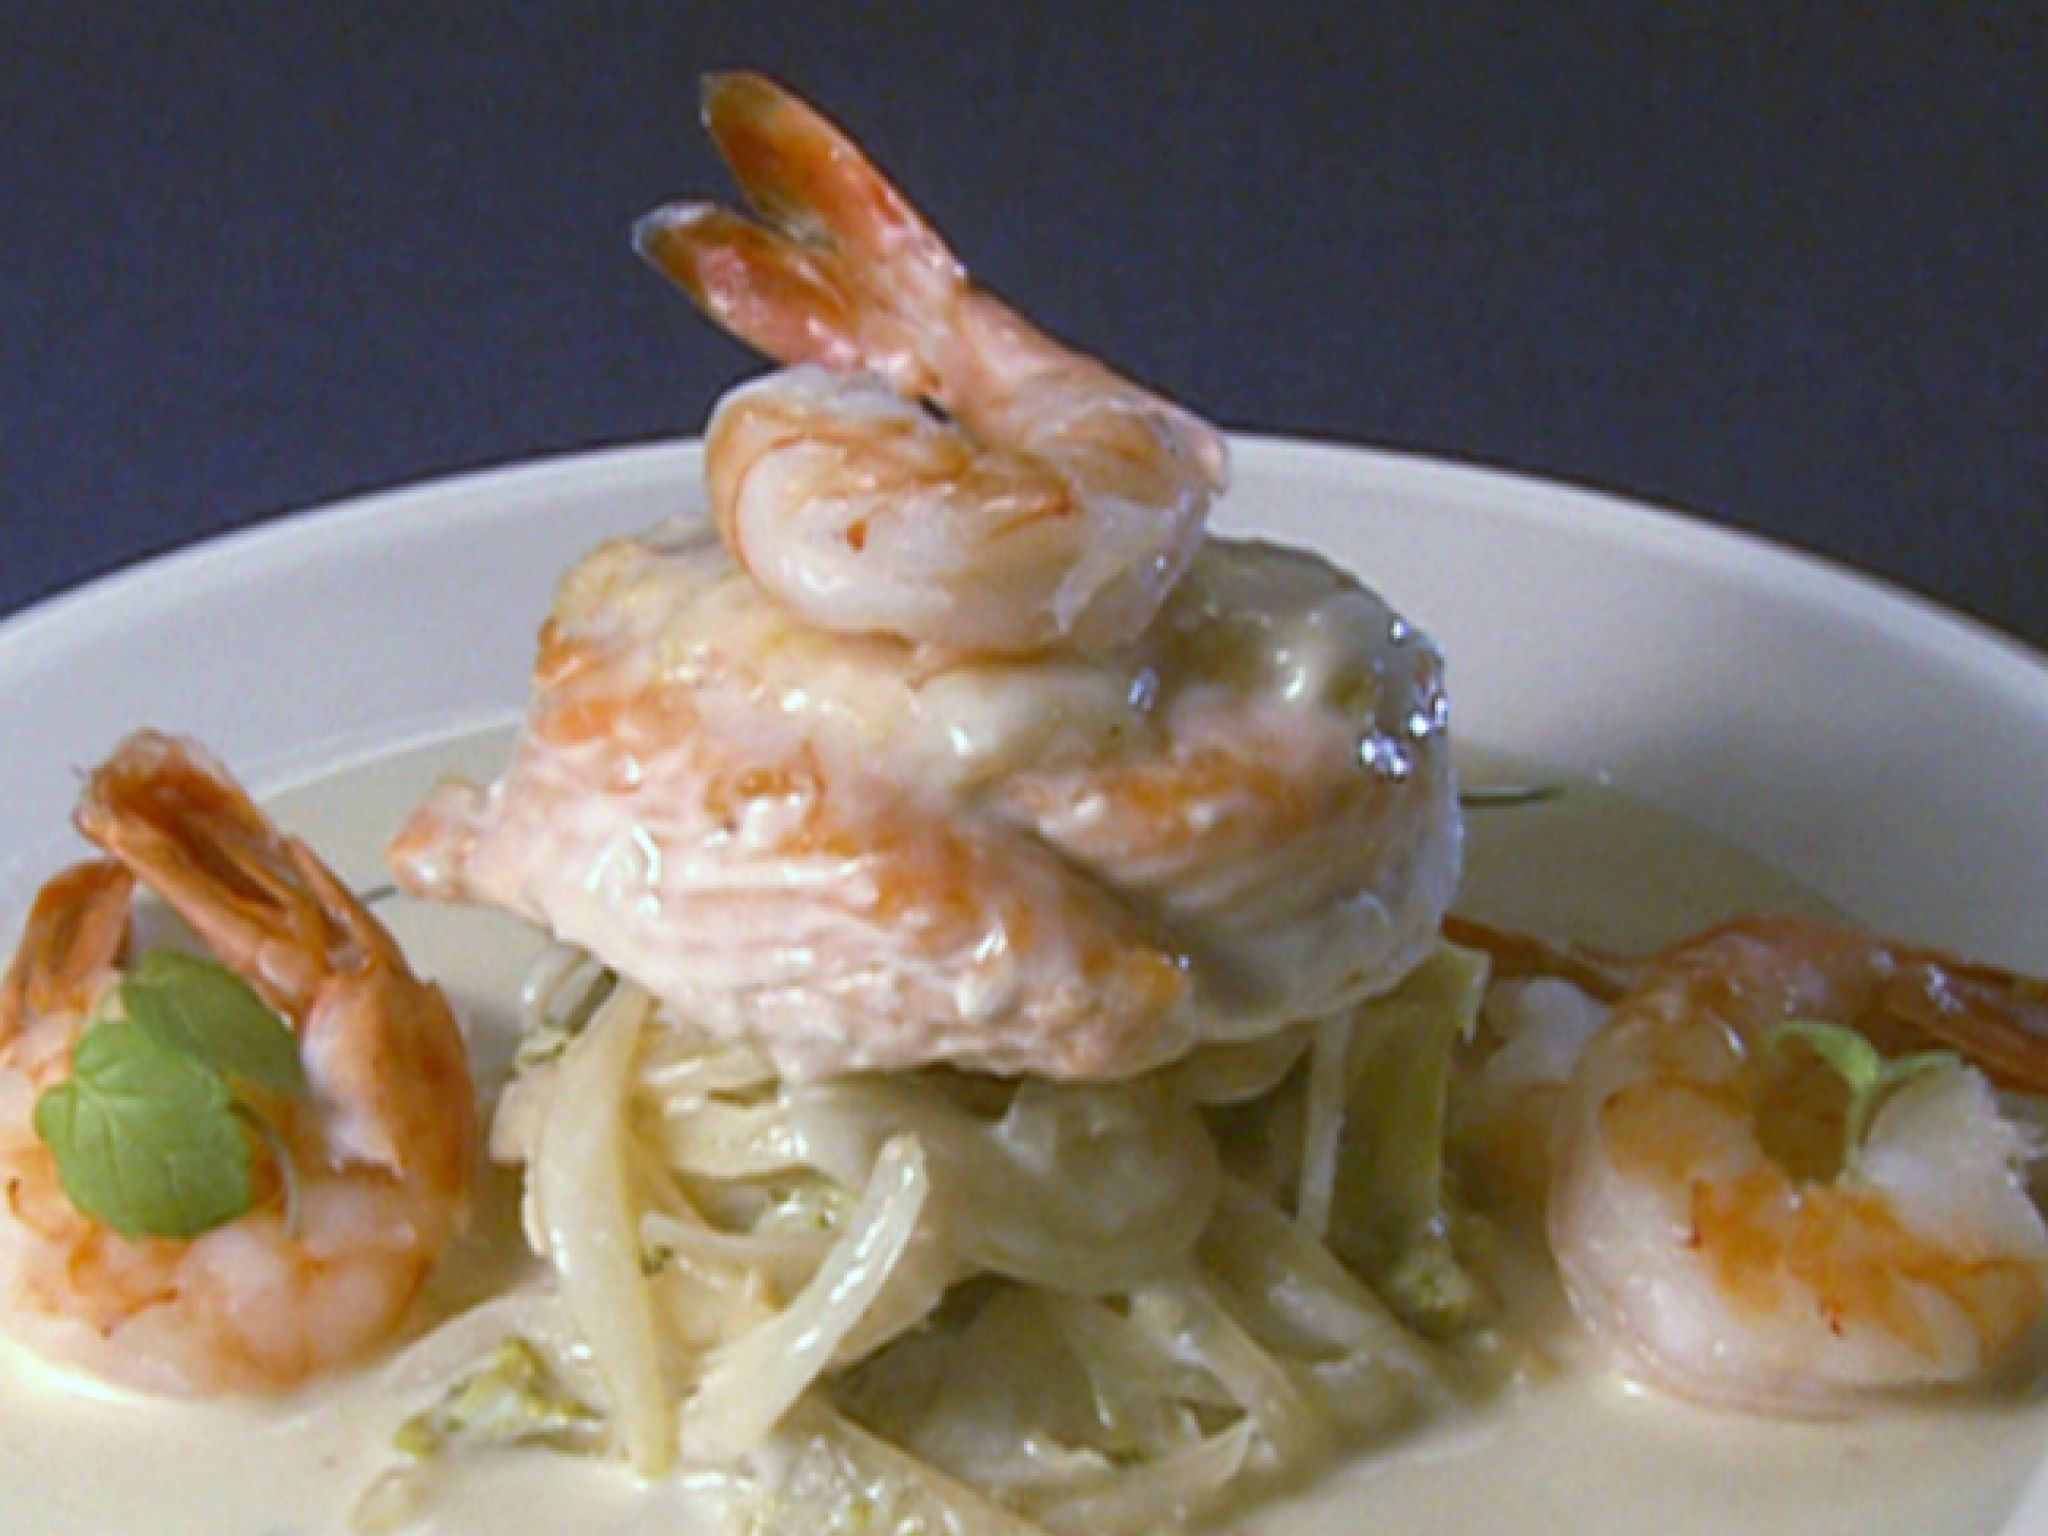 Salmon-Shrimp Spirals recipe from Robert Irvine via Food Network